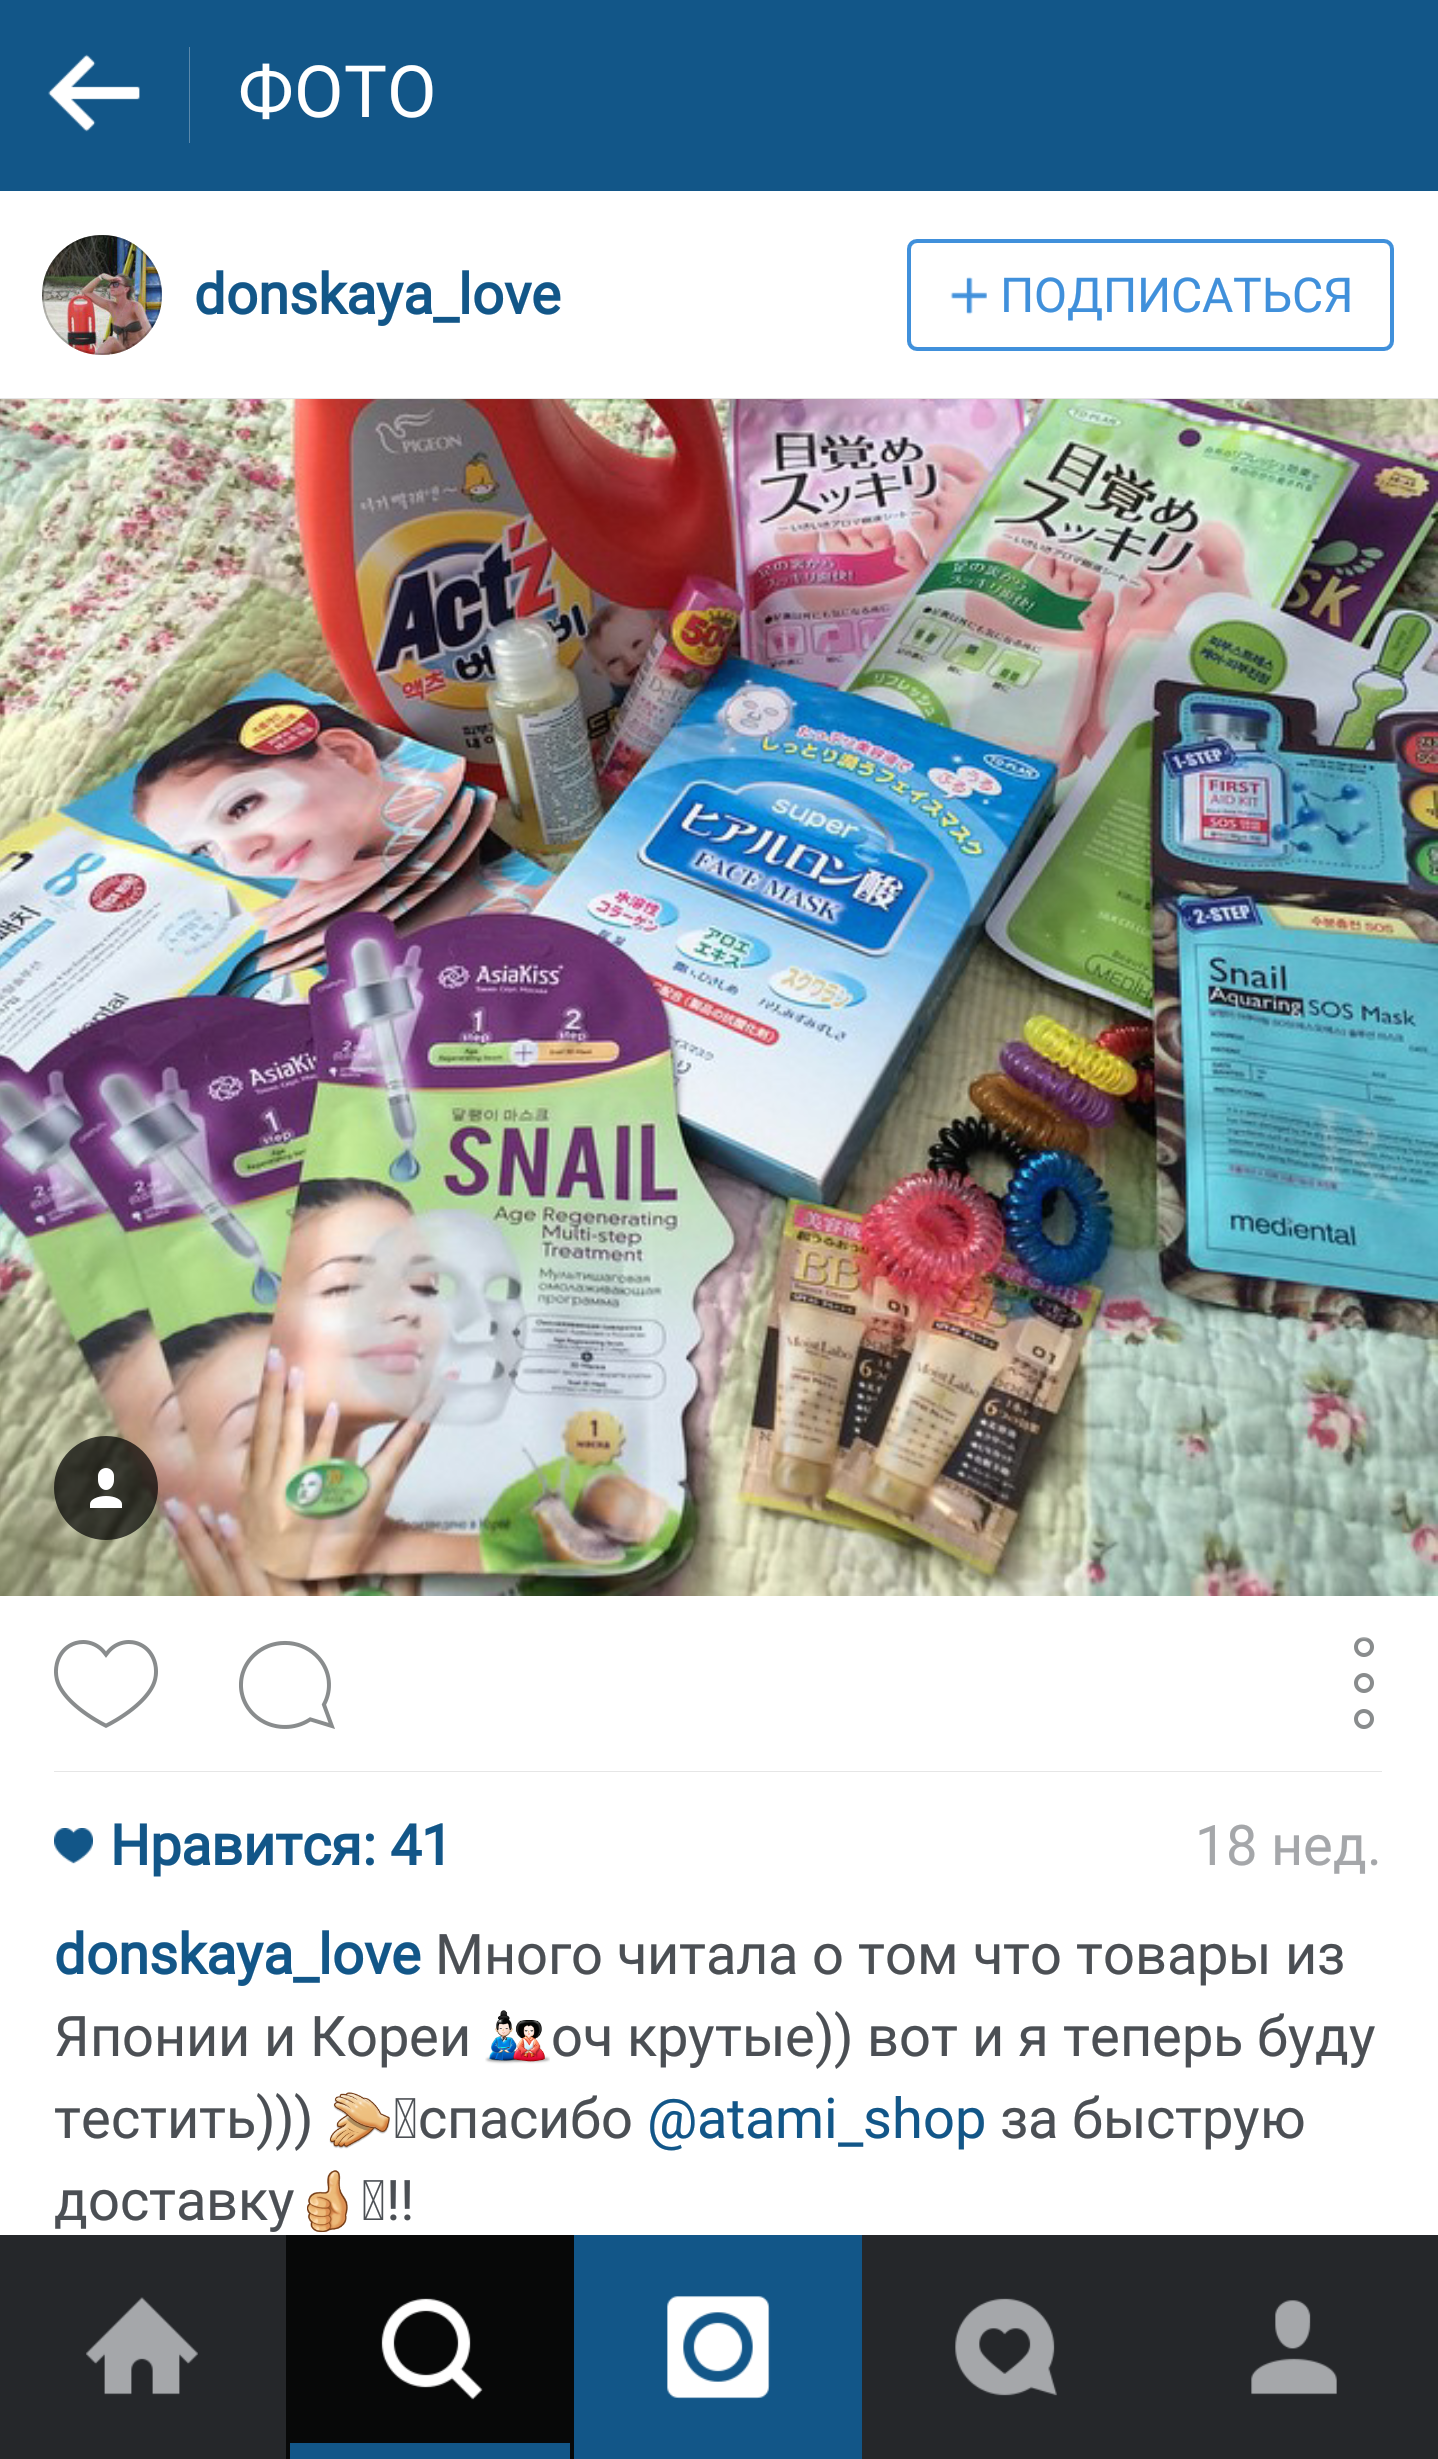 Screenshot_2015-08-31-16-50-24.png